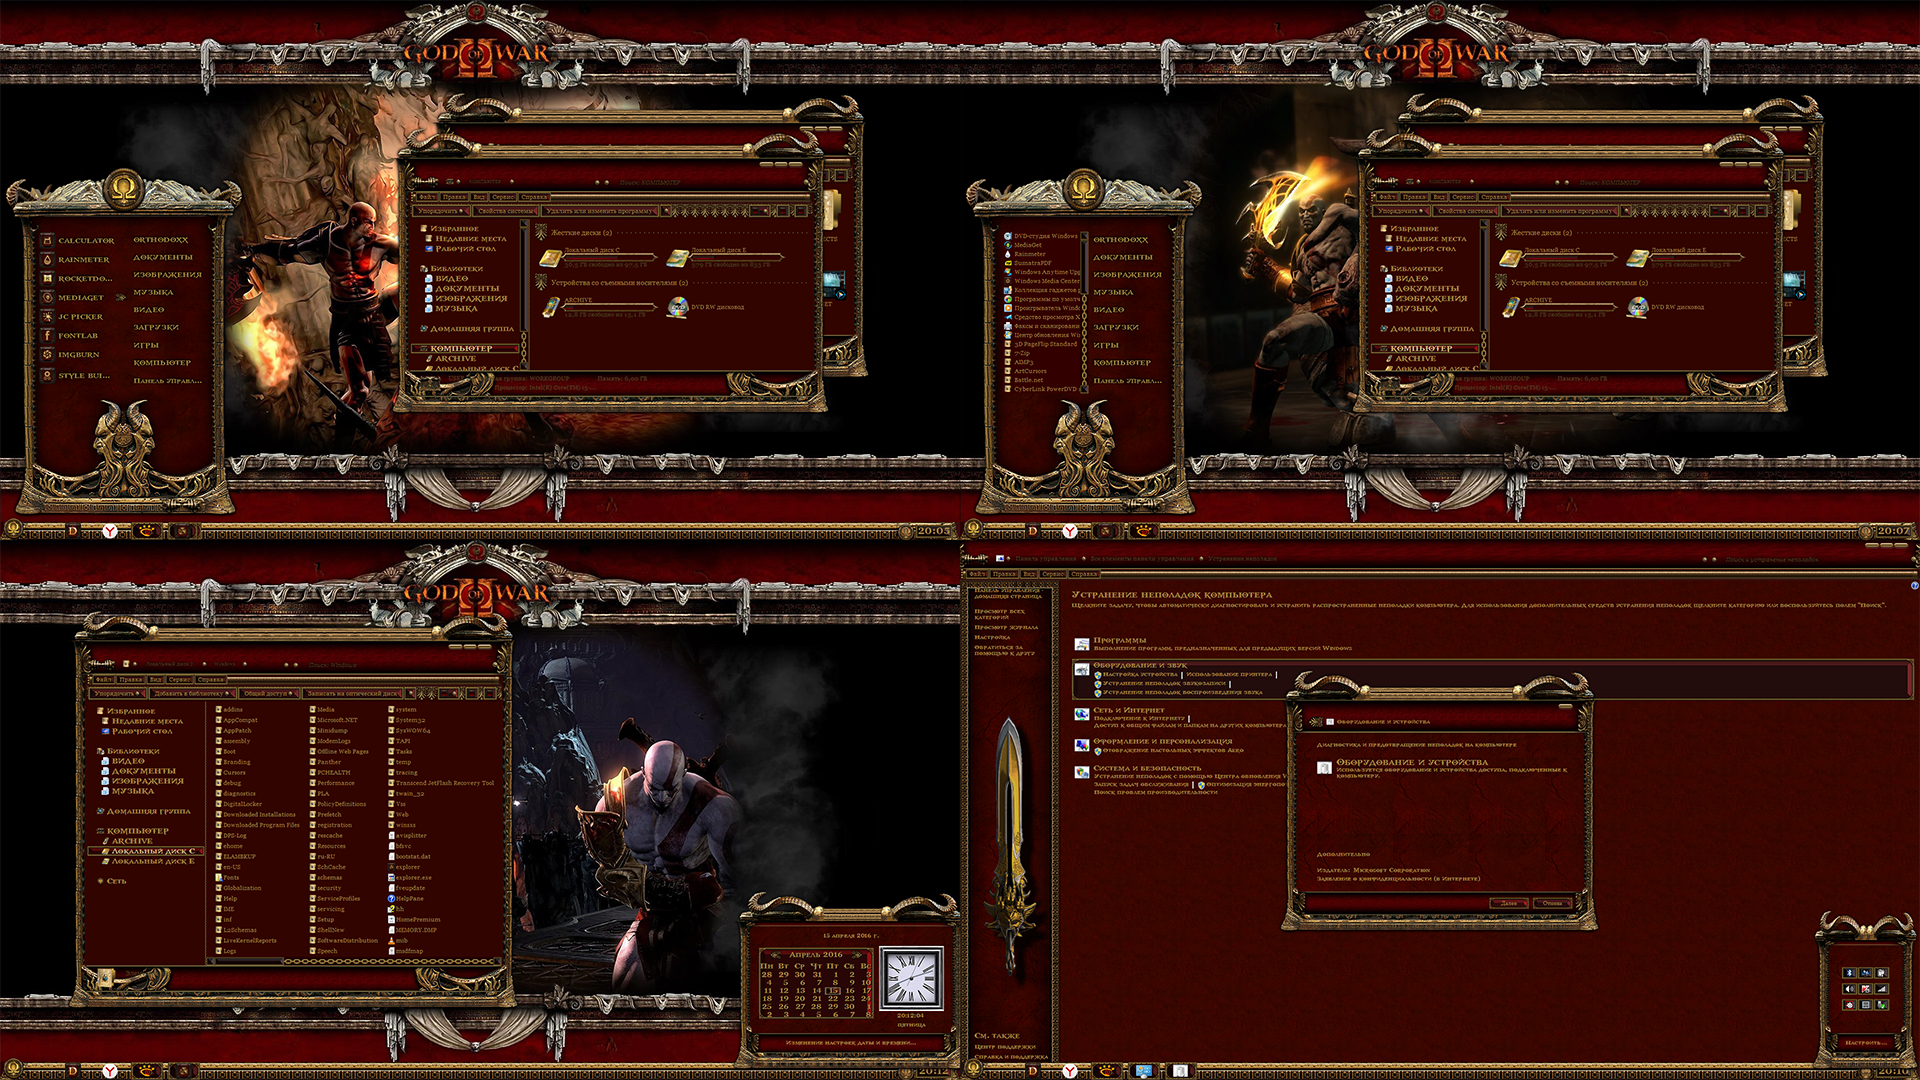 GOD OF WAR theme by ORTHODOXX67